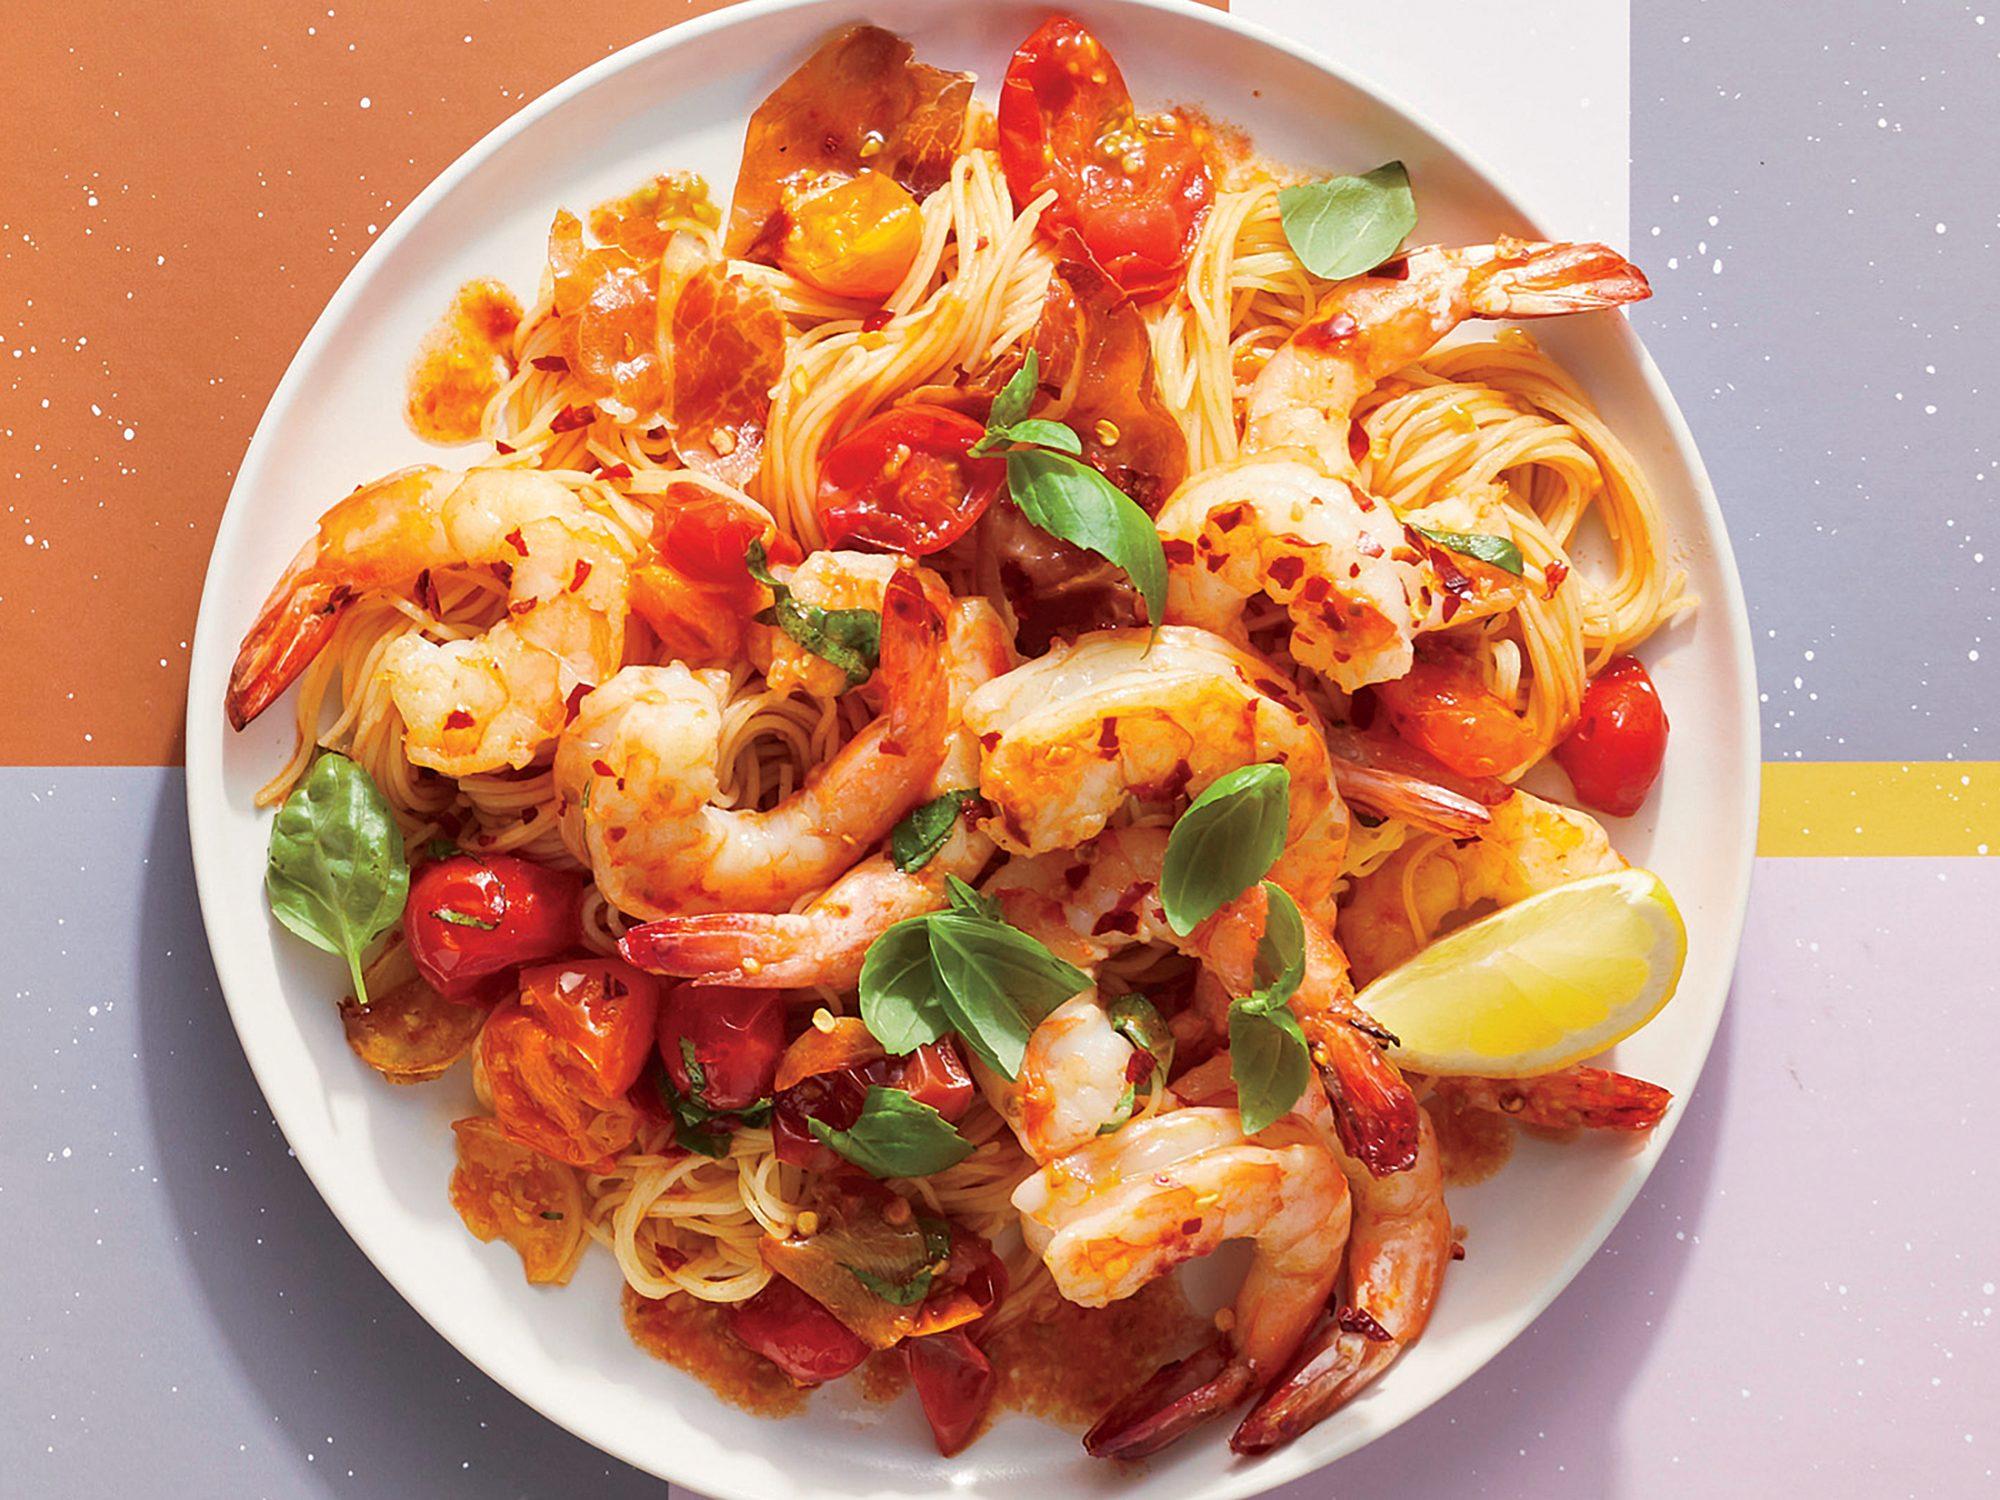 Simple Lemon, Shrimp, and Prosciutto Pasta